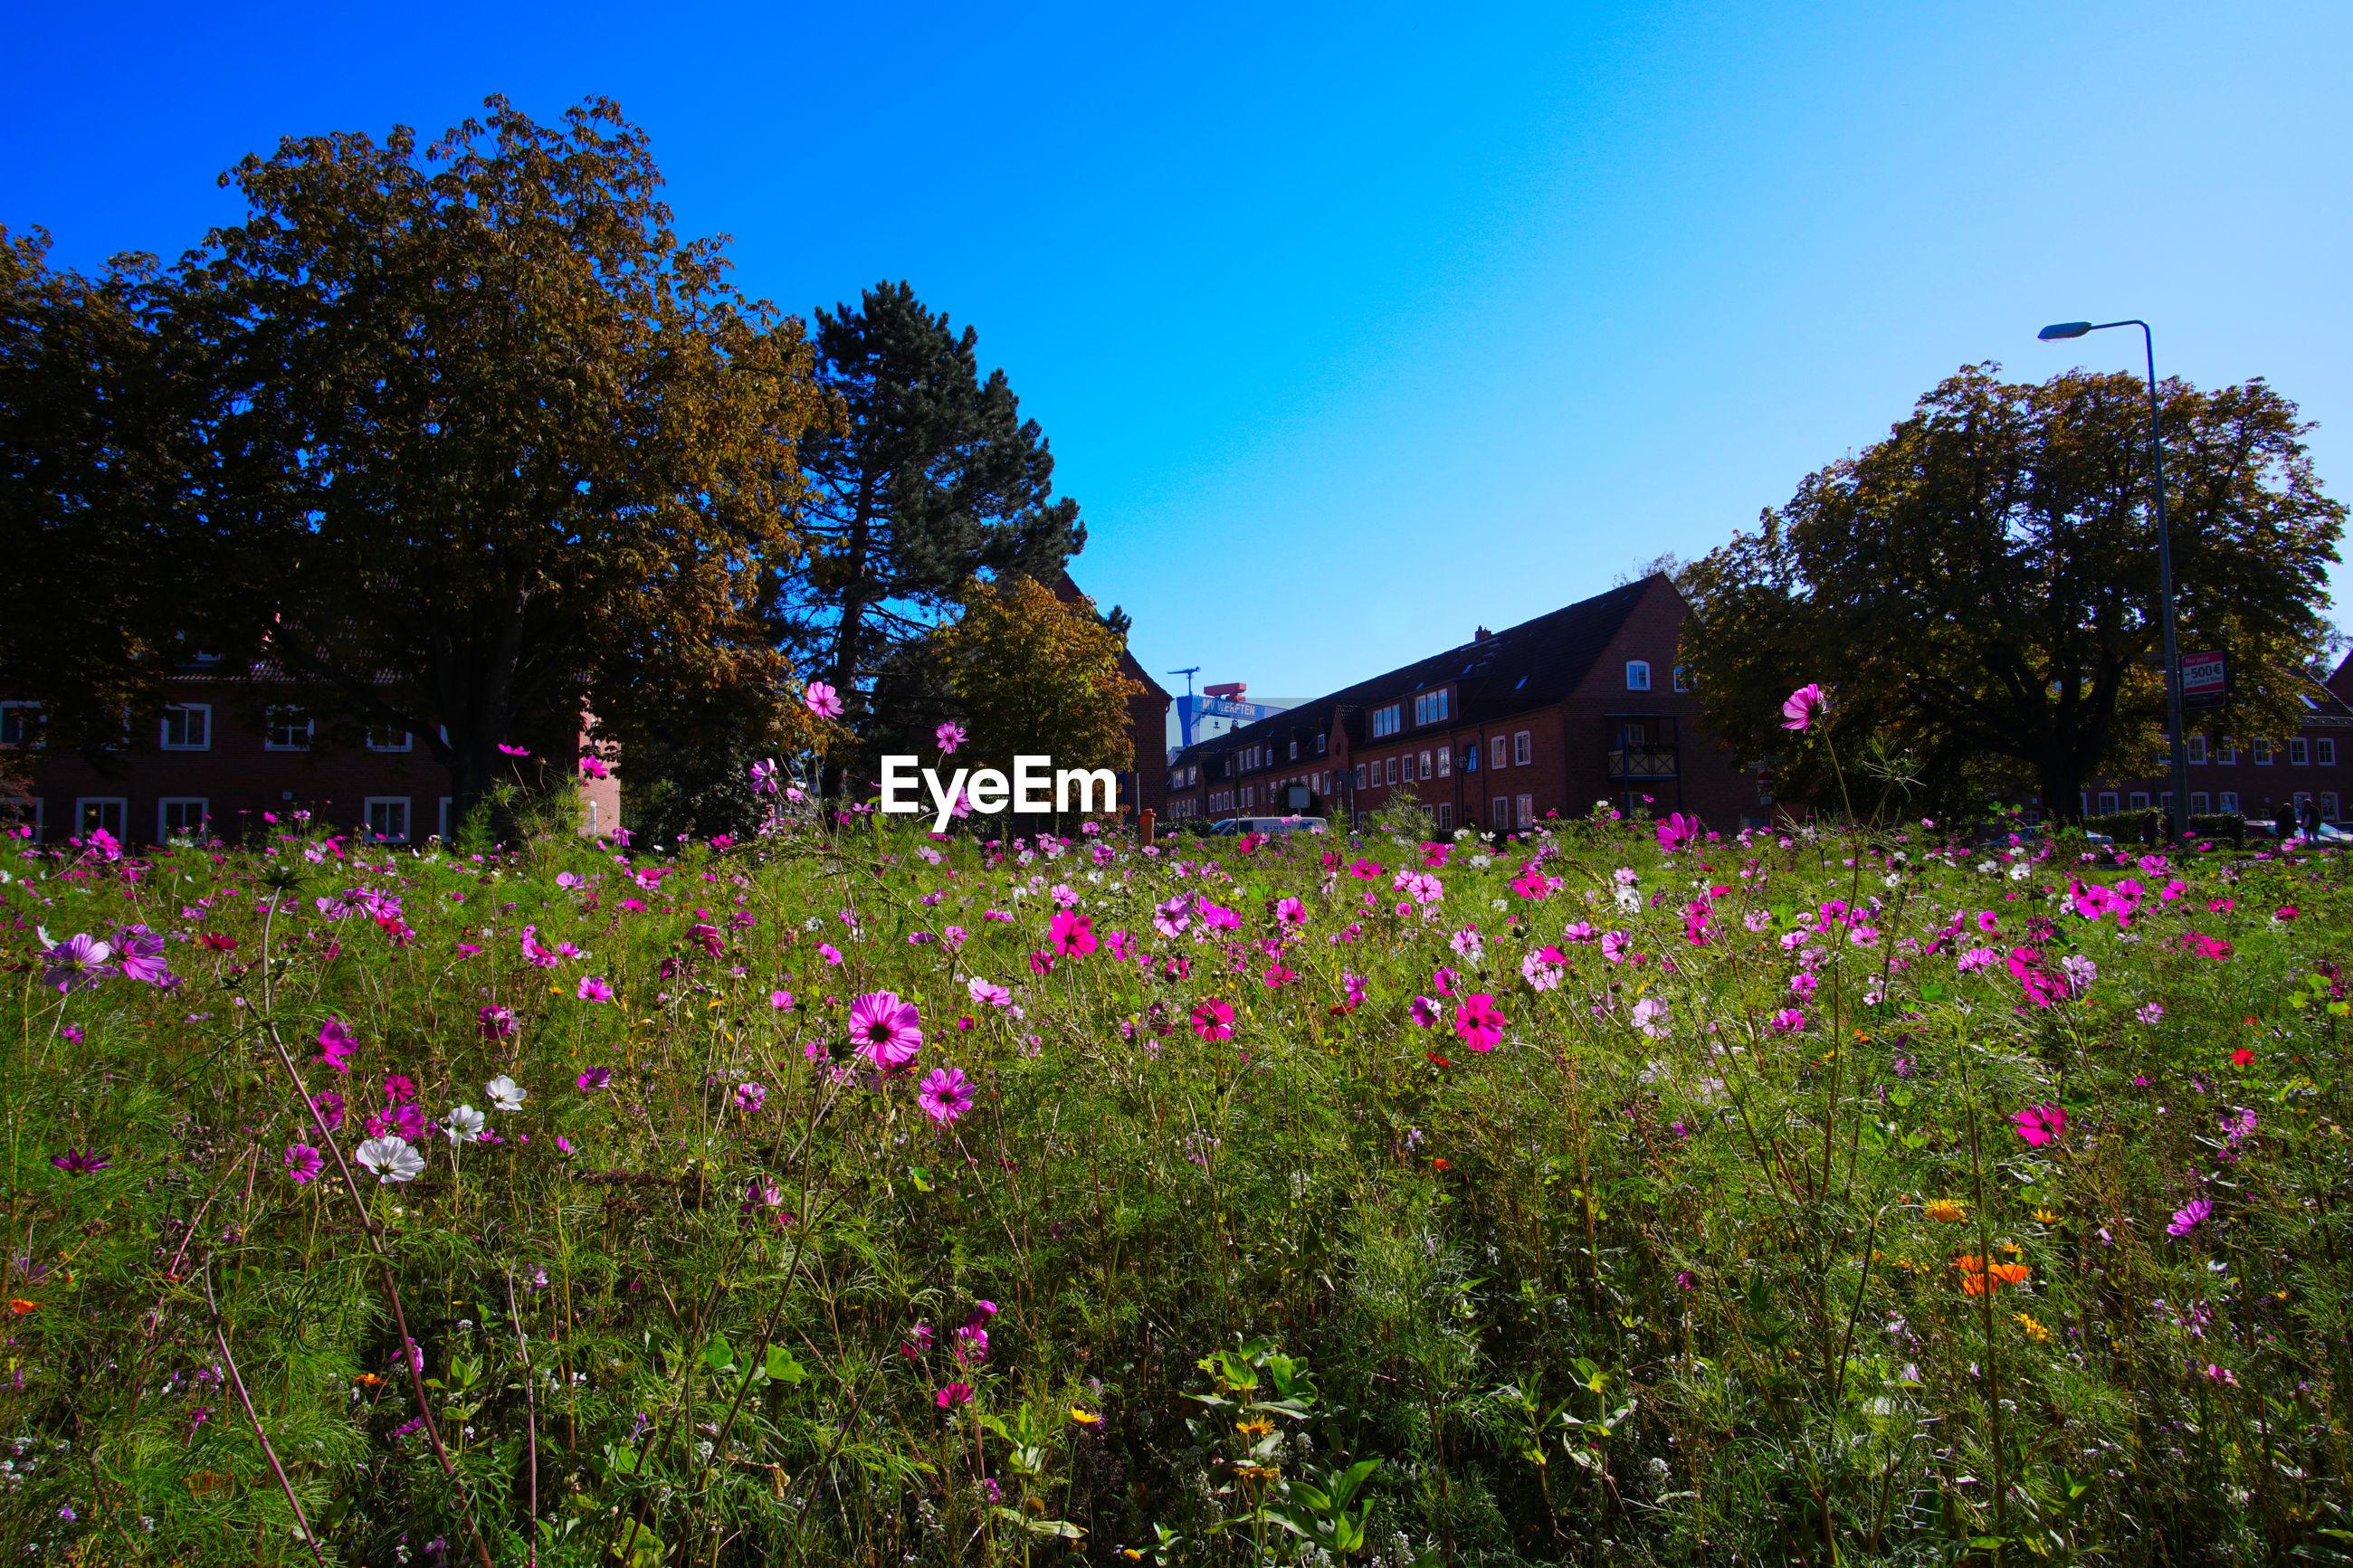 PINK FLOWERING PLANTS BY TREES AGAINST SKY